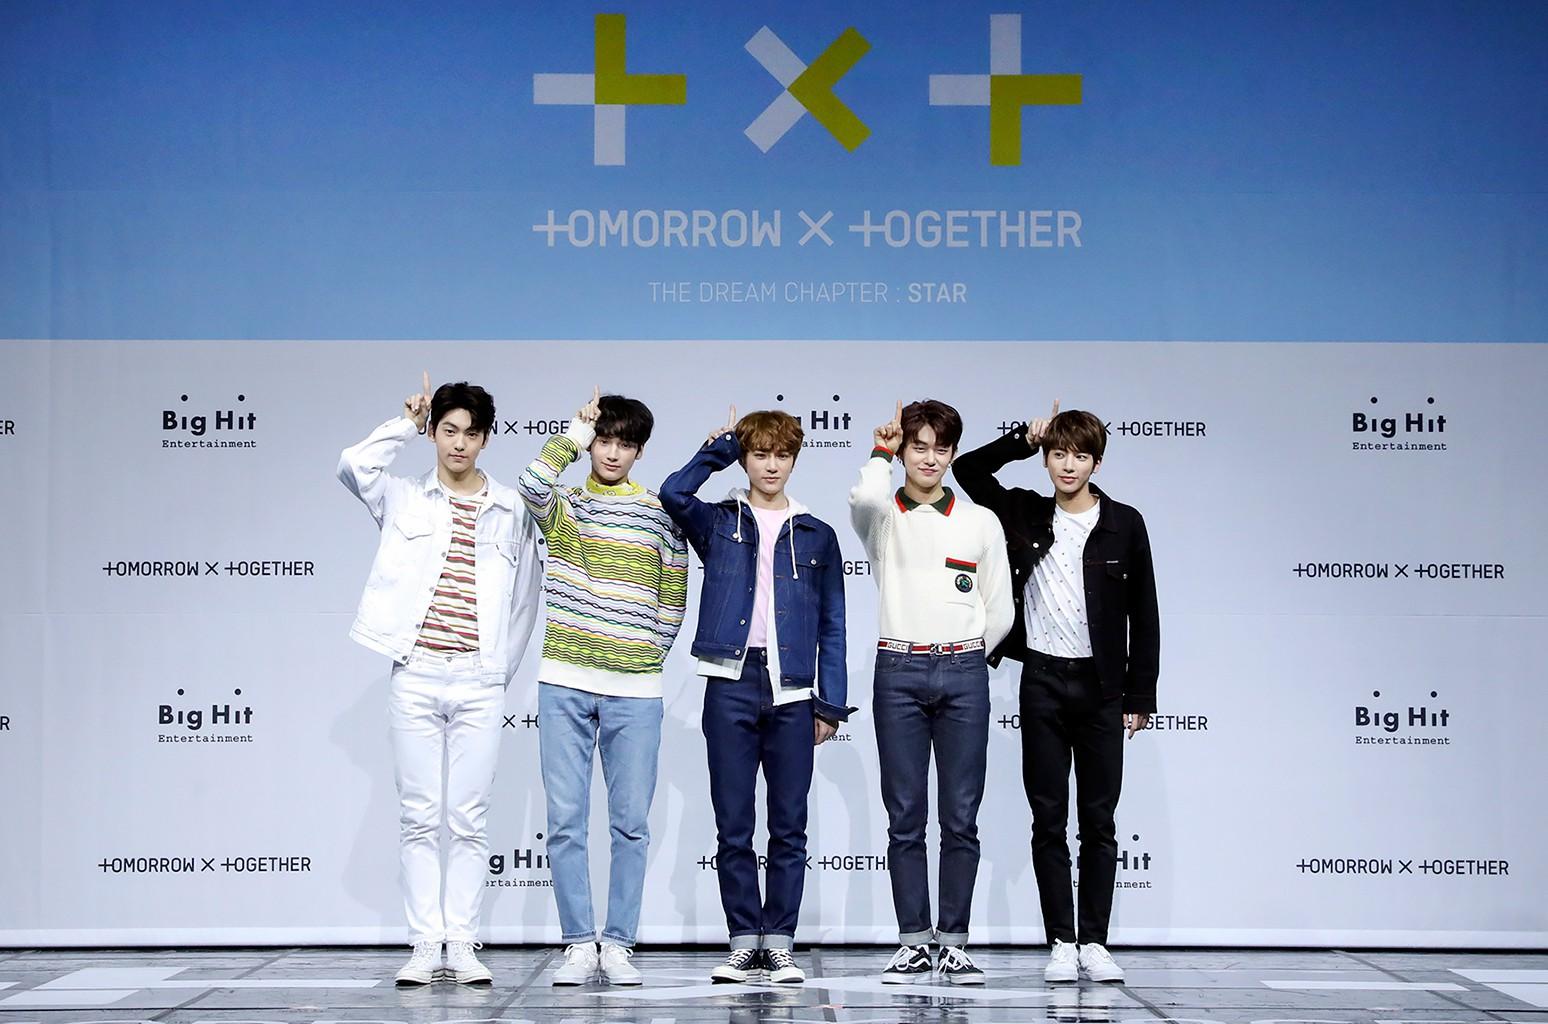 tomorrow-x-together-showcase-big-hit-ent-2019-billboard-1548-1557976357353964571375.jpg